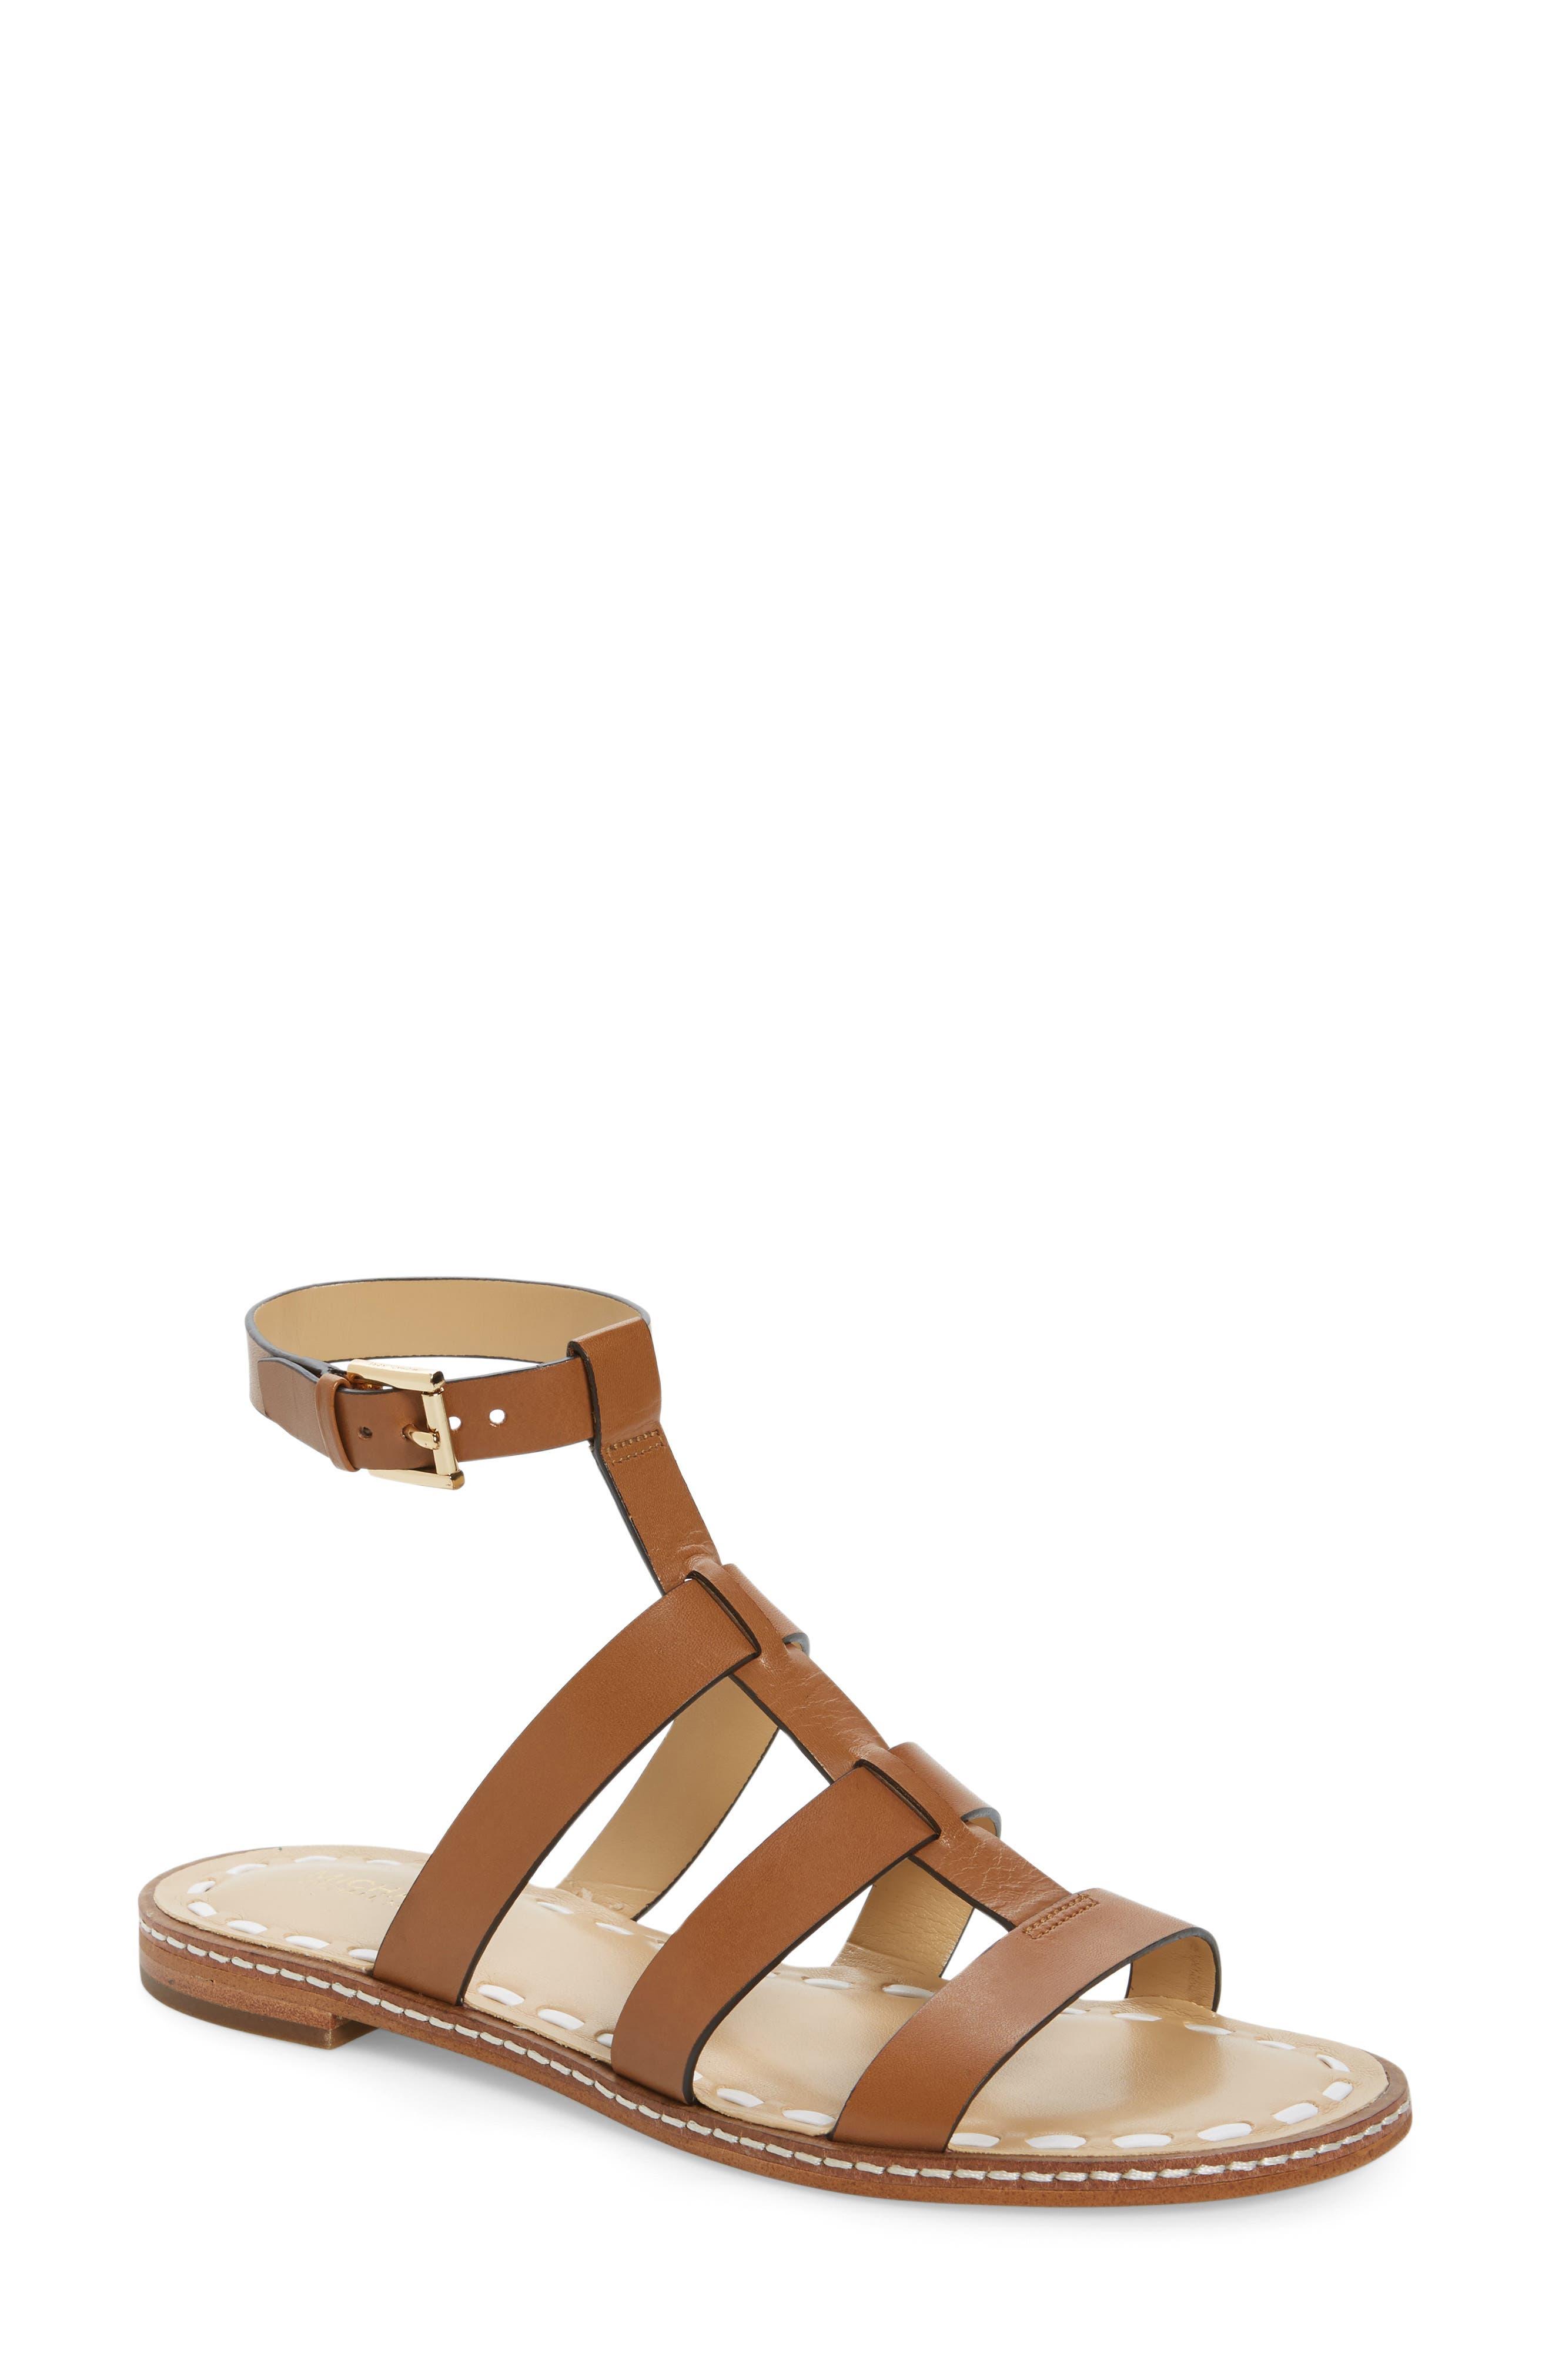 Fallon Gladiator Sandal,                         Main,                         color, Acorn/ White Leather